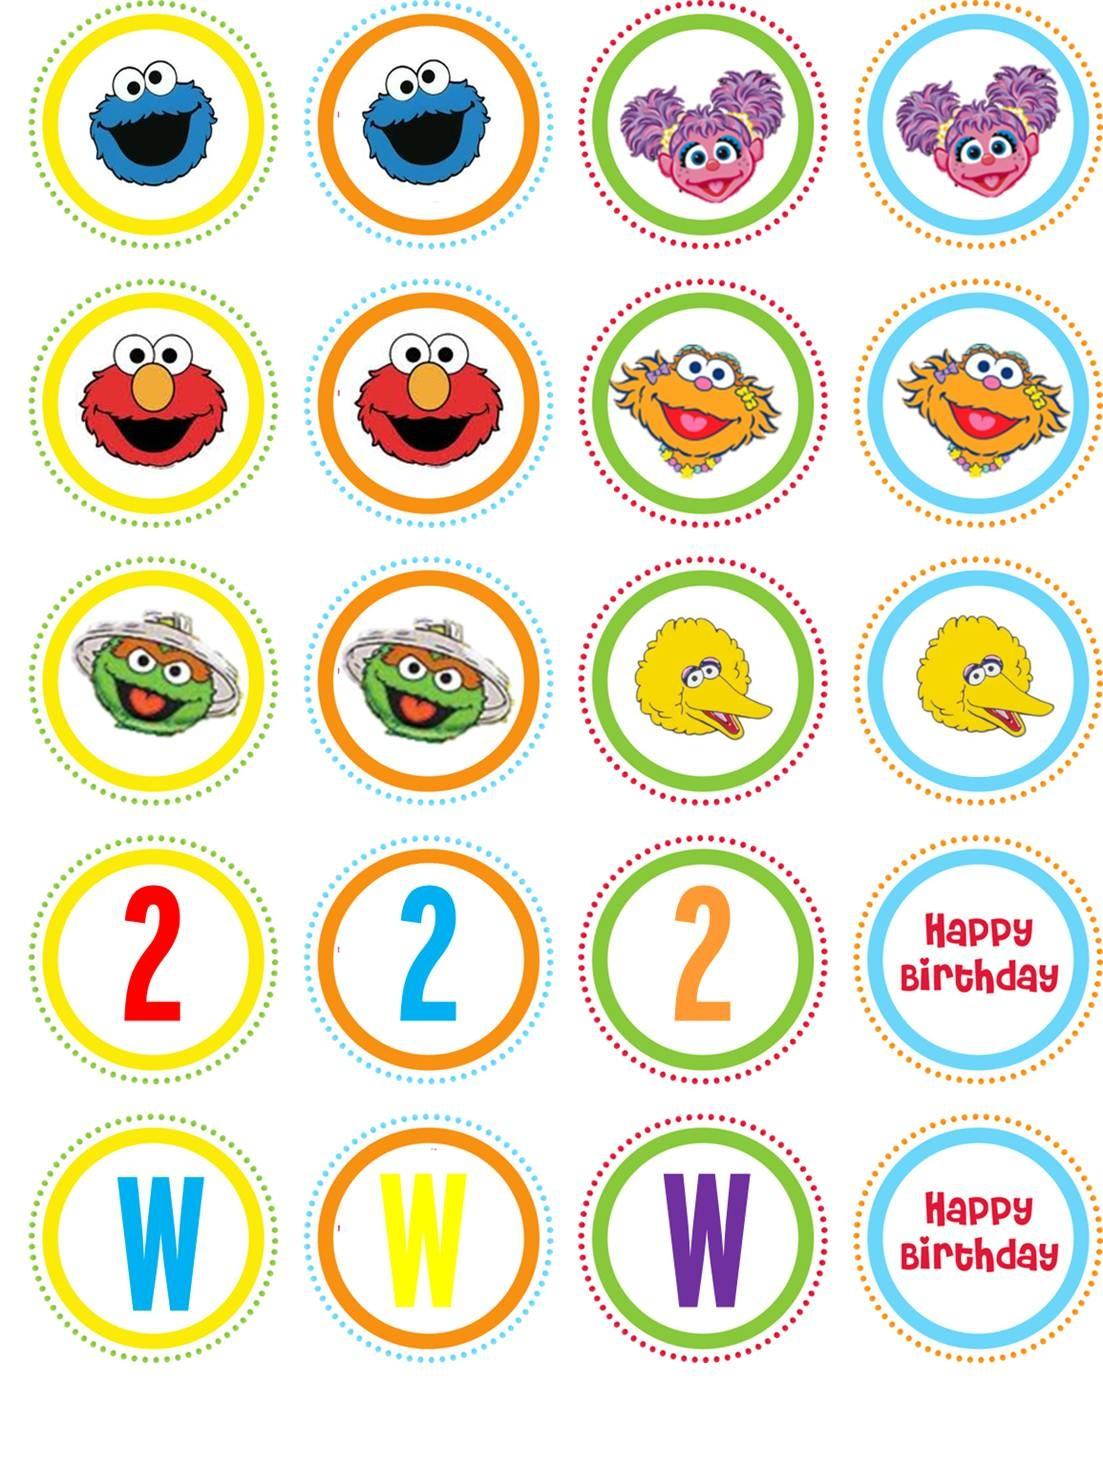 Pinjennifer Mercado On Sesame St   Pinterest - Free Printable Sesame Street Cupcake Toppers